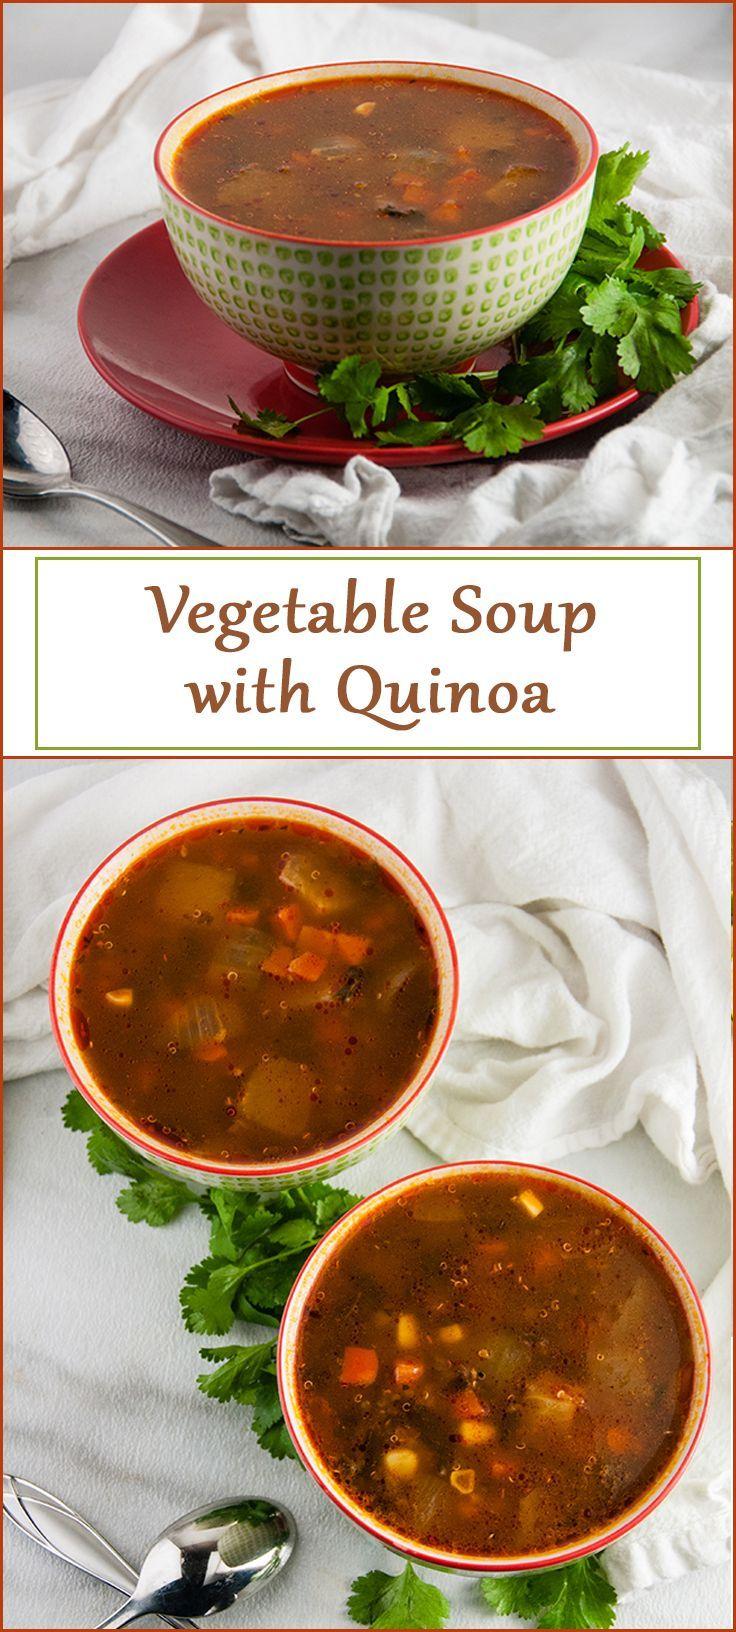 Vegetable Soup with Quinoa Recipe Quinoa soup